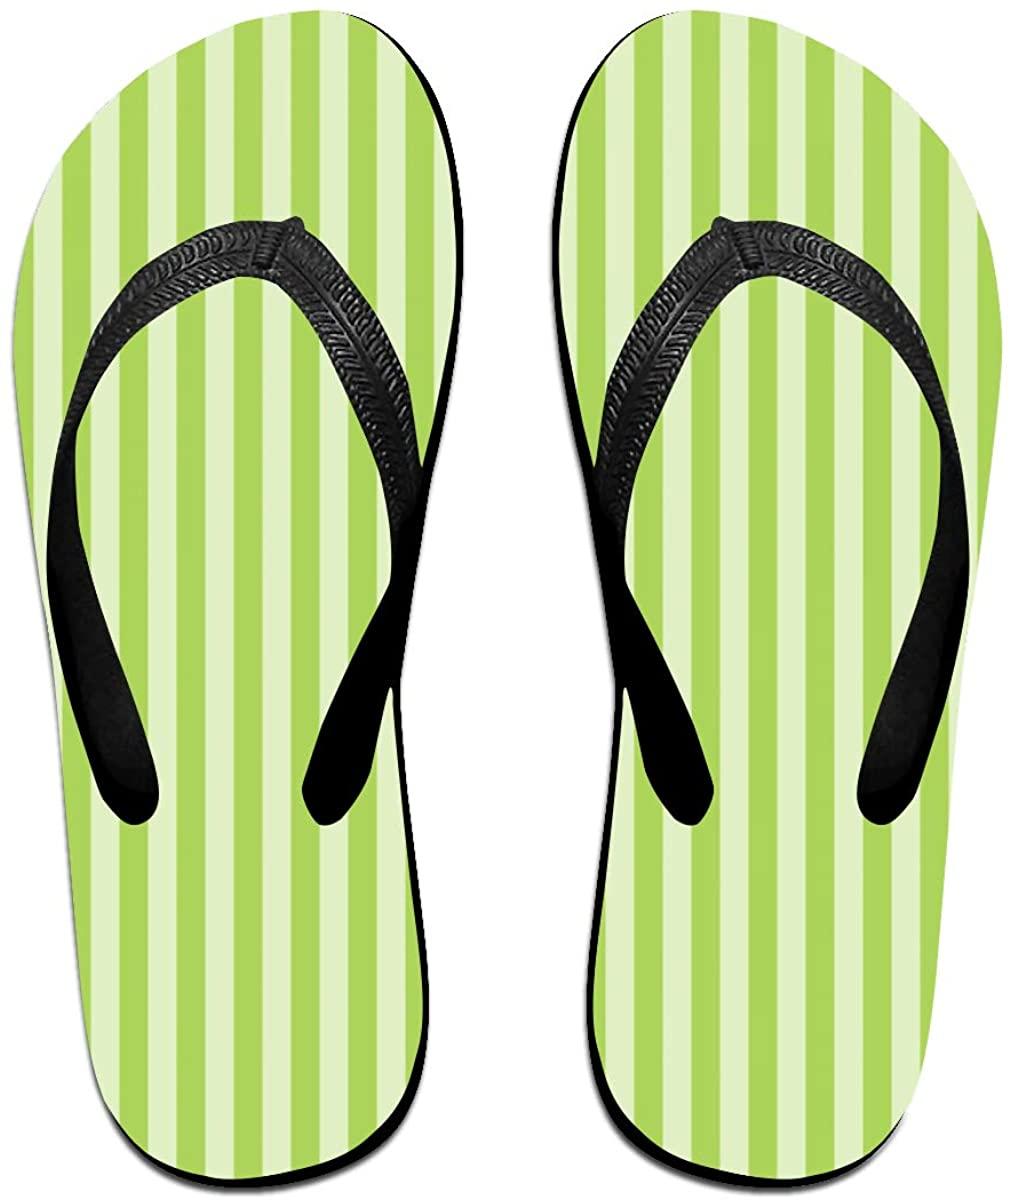 TJNMU Black White Stripes Flip Flops Printing Sandals Fashion Beach Slippers-4